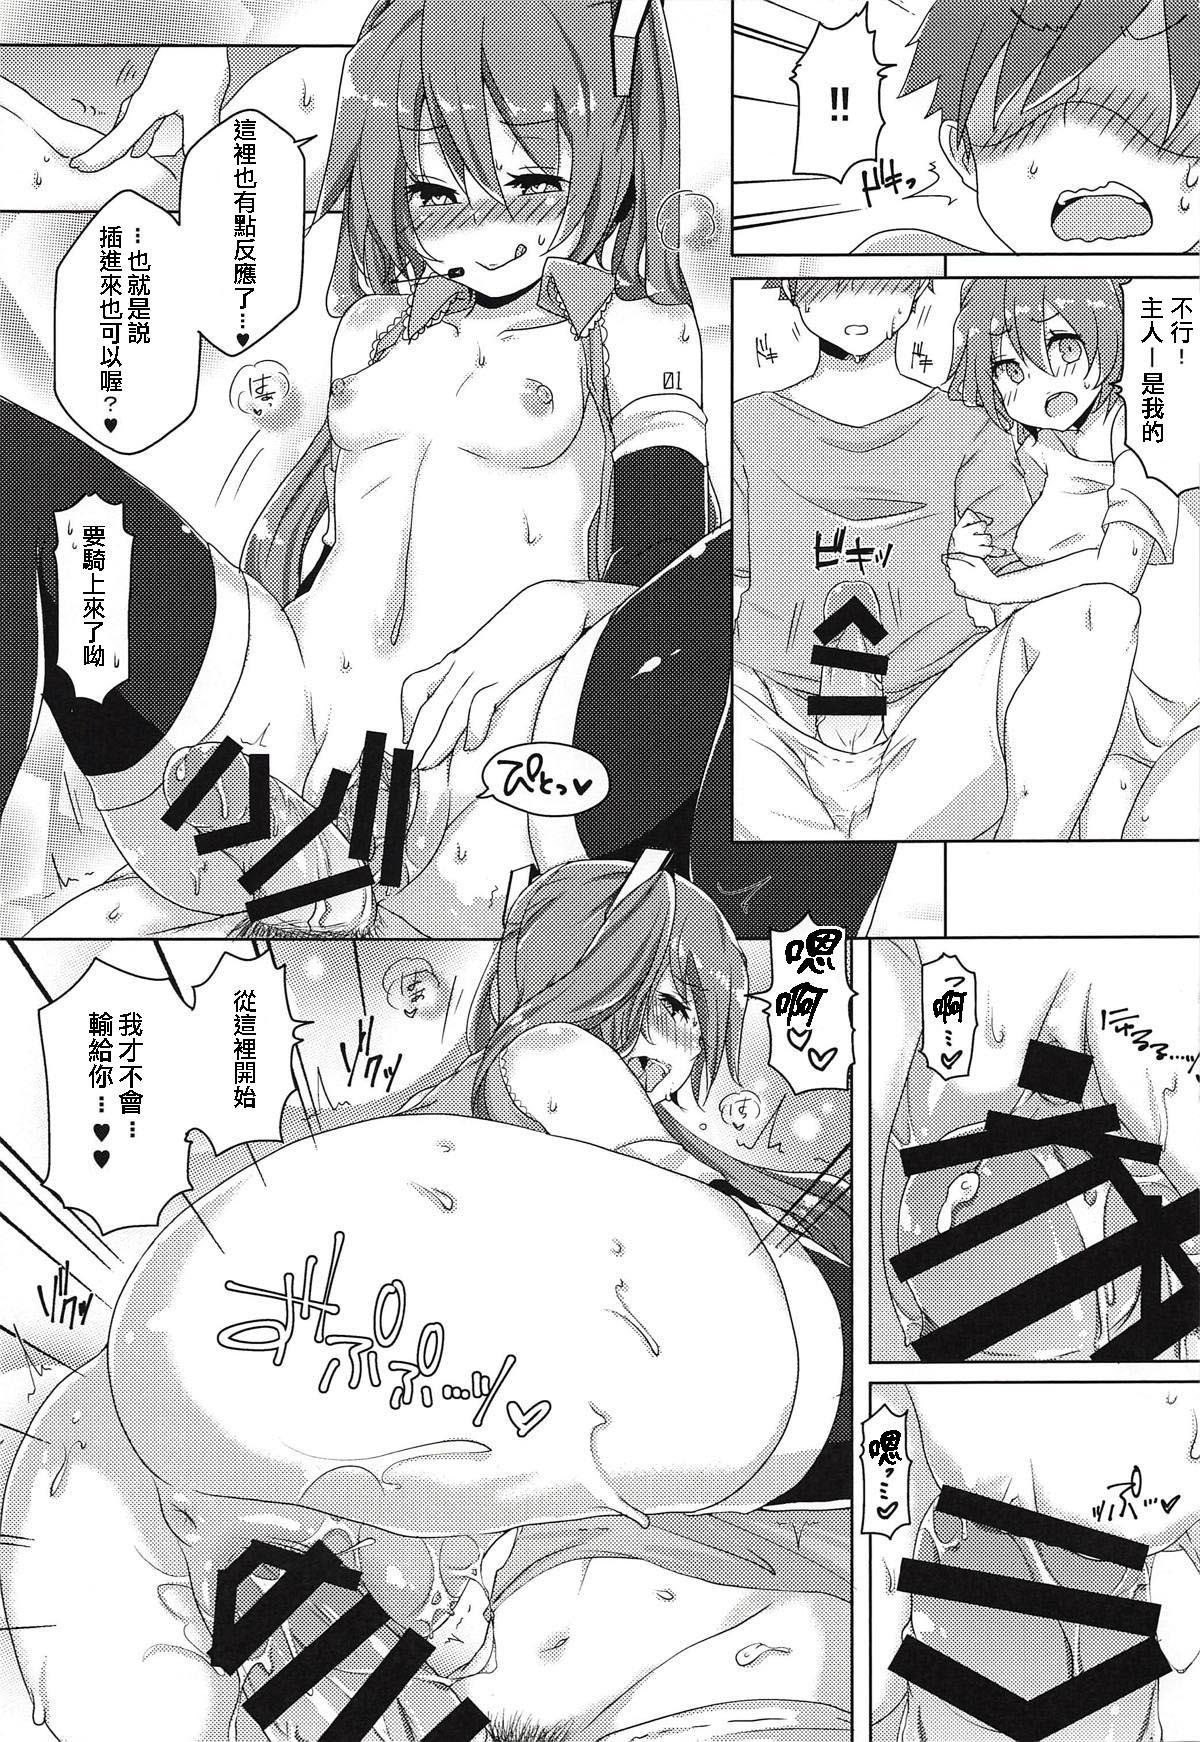 (THE VOC@LOiD M@STER 41) [Kusoyuridanchi (Johnson)] Chippai-san to Deppai-san (VOCALOID) [Chinese] [舒馬克個人漢化] 11